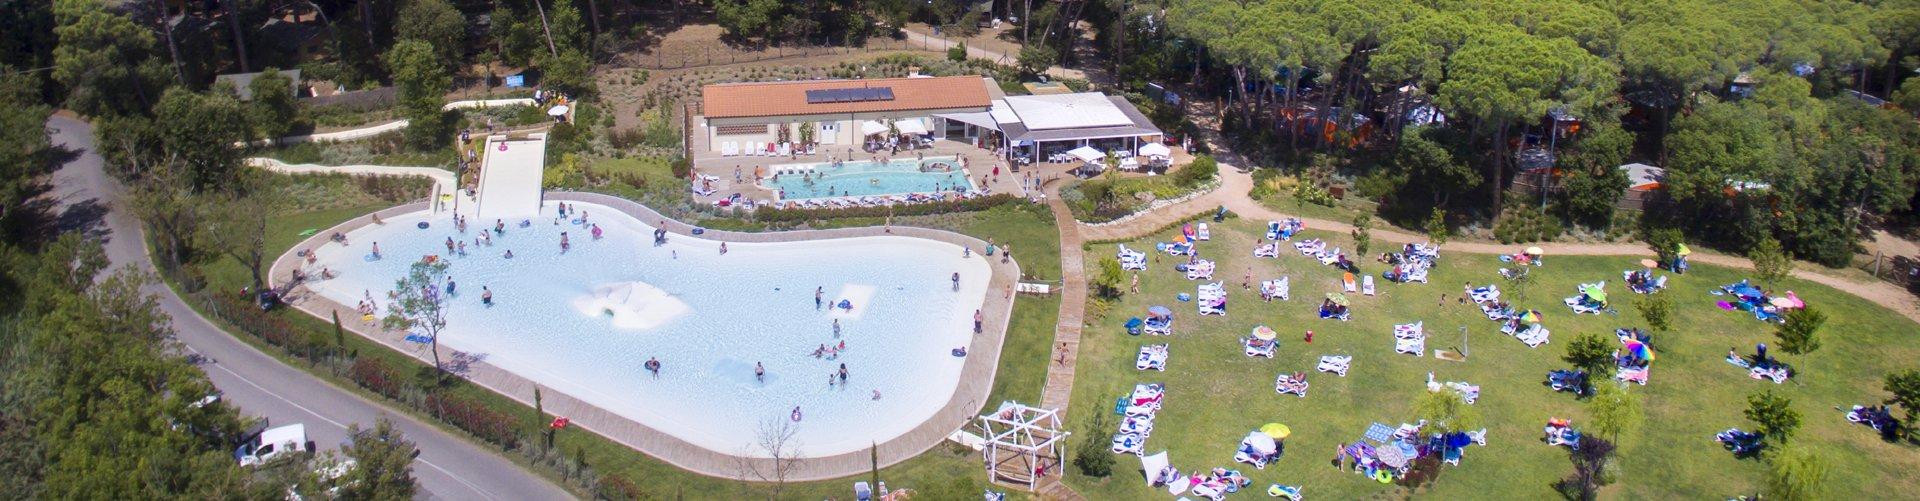 banner etruria  - zwembad